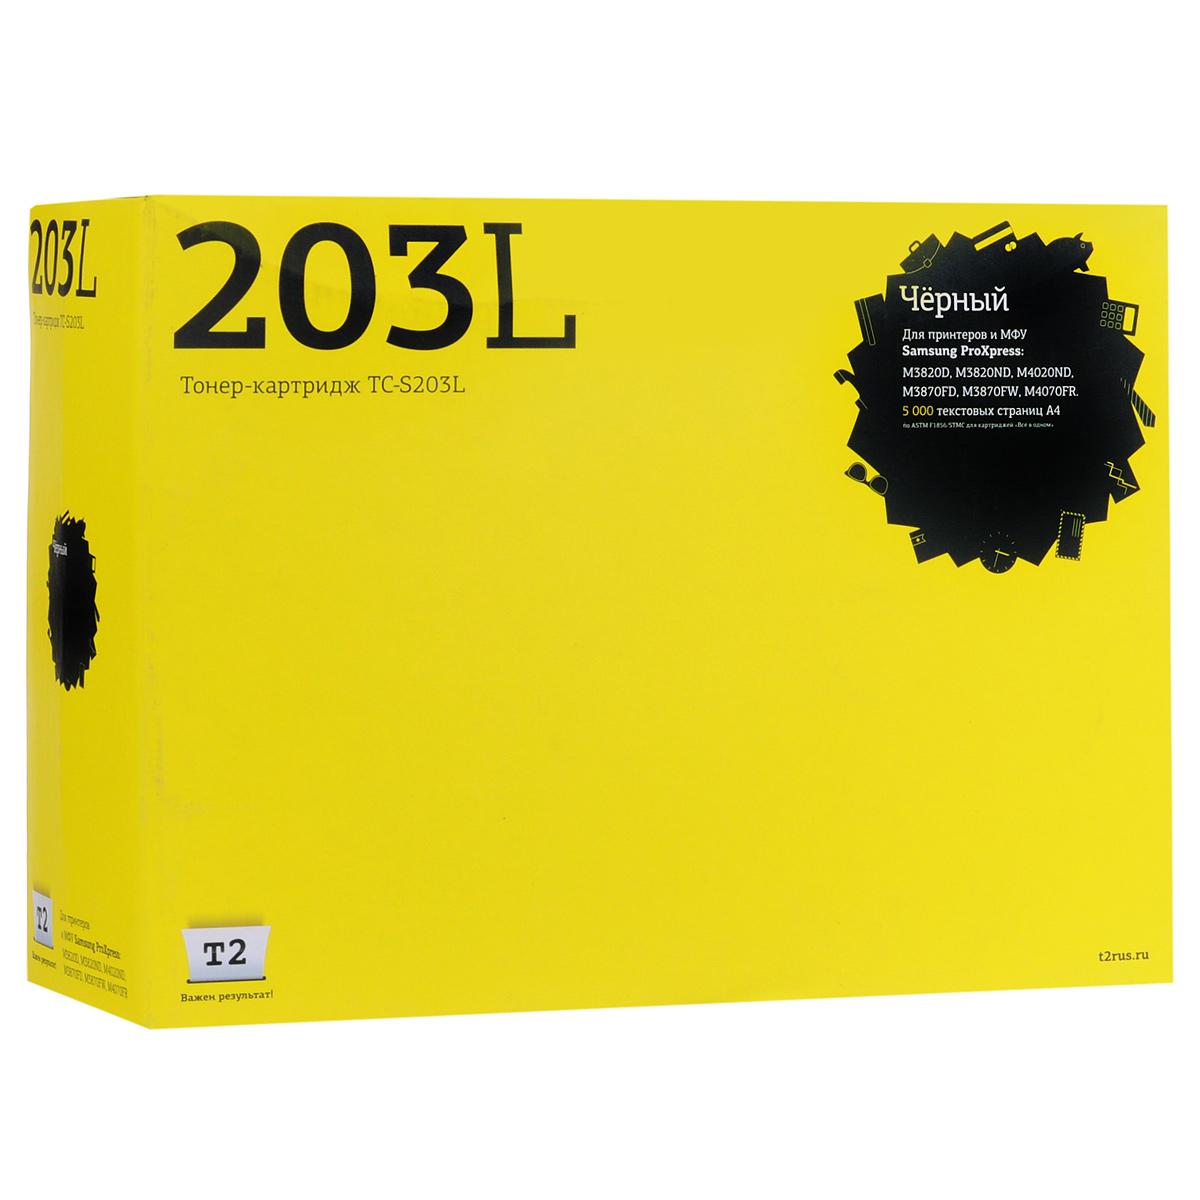 T2 TC-S203L картридж (аналог MLT-D203L) для Samsung ProXpress M3820D/M4020ND/M3870FD/M4070FR цена